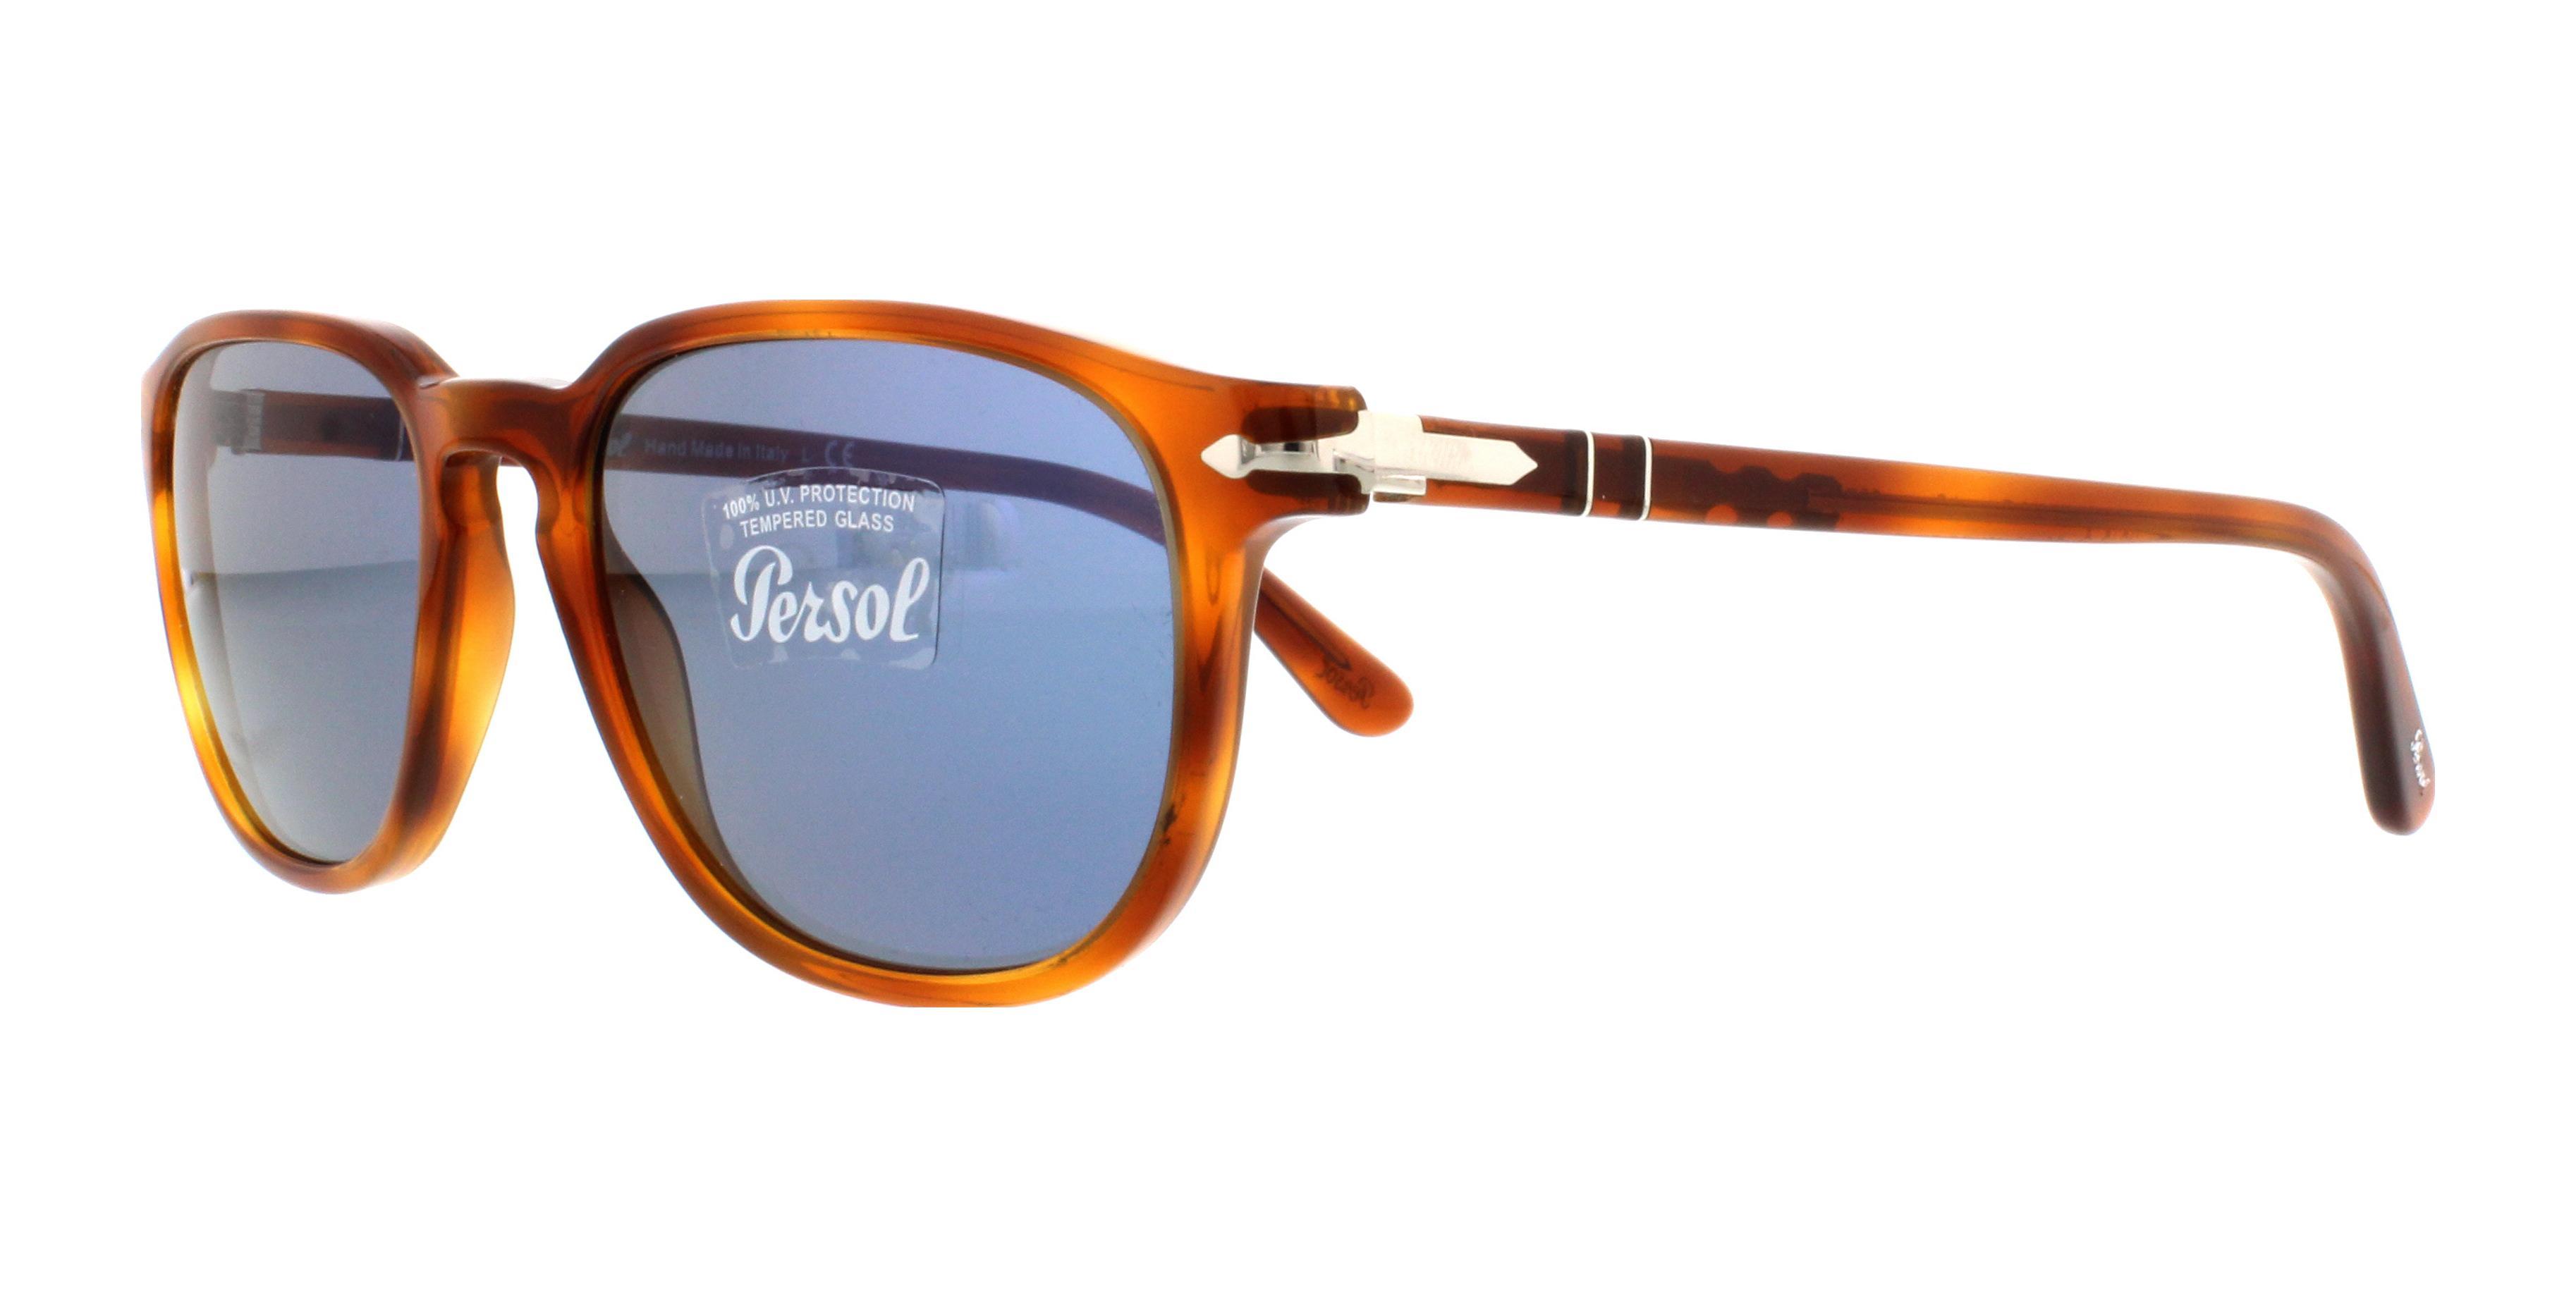 6c25856490 Persol Men s Eyeglass Frames 3105 Reviews